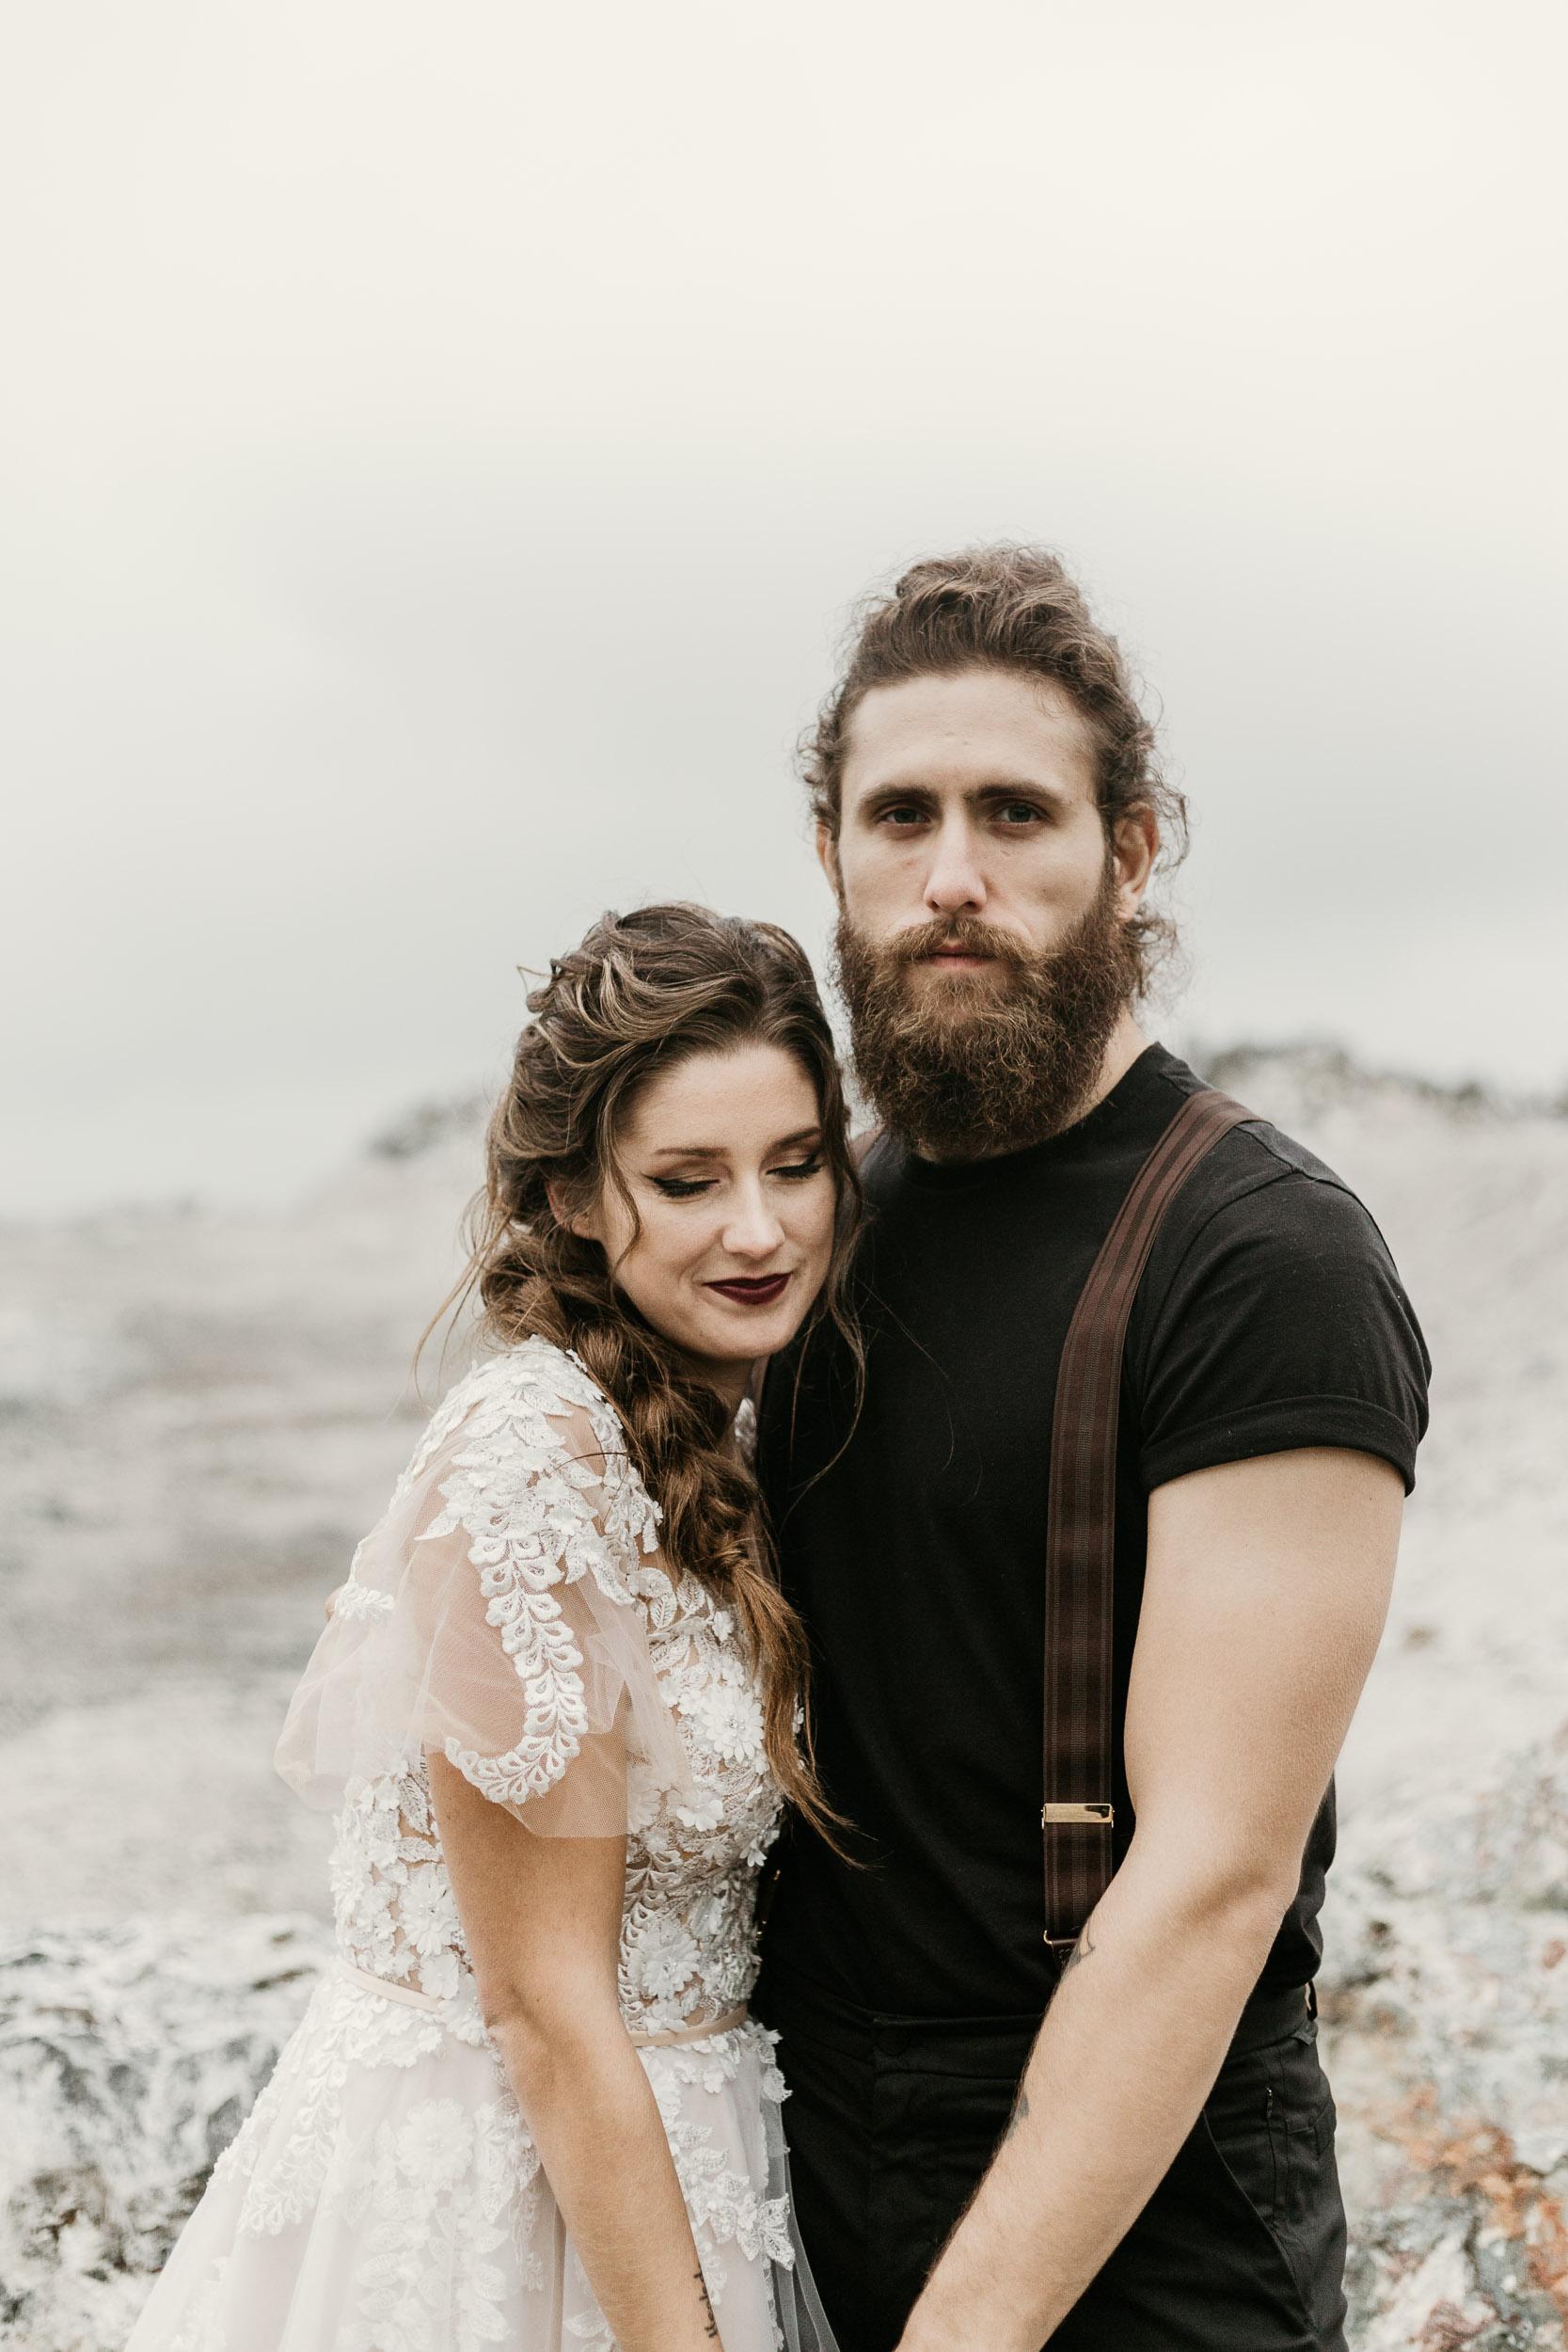 intimate-wedding-elopement-photographer-ottawa-toronto-1152.jpg